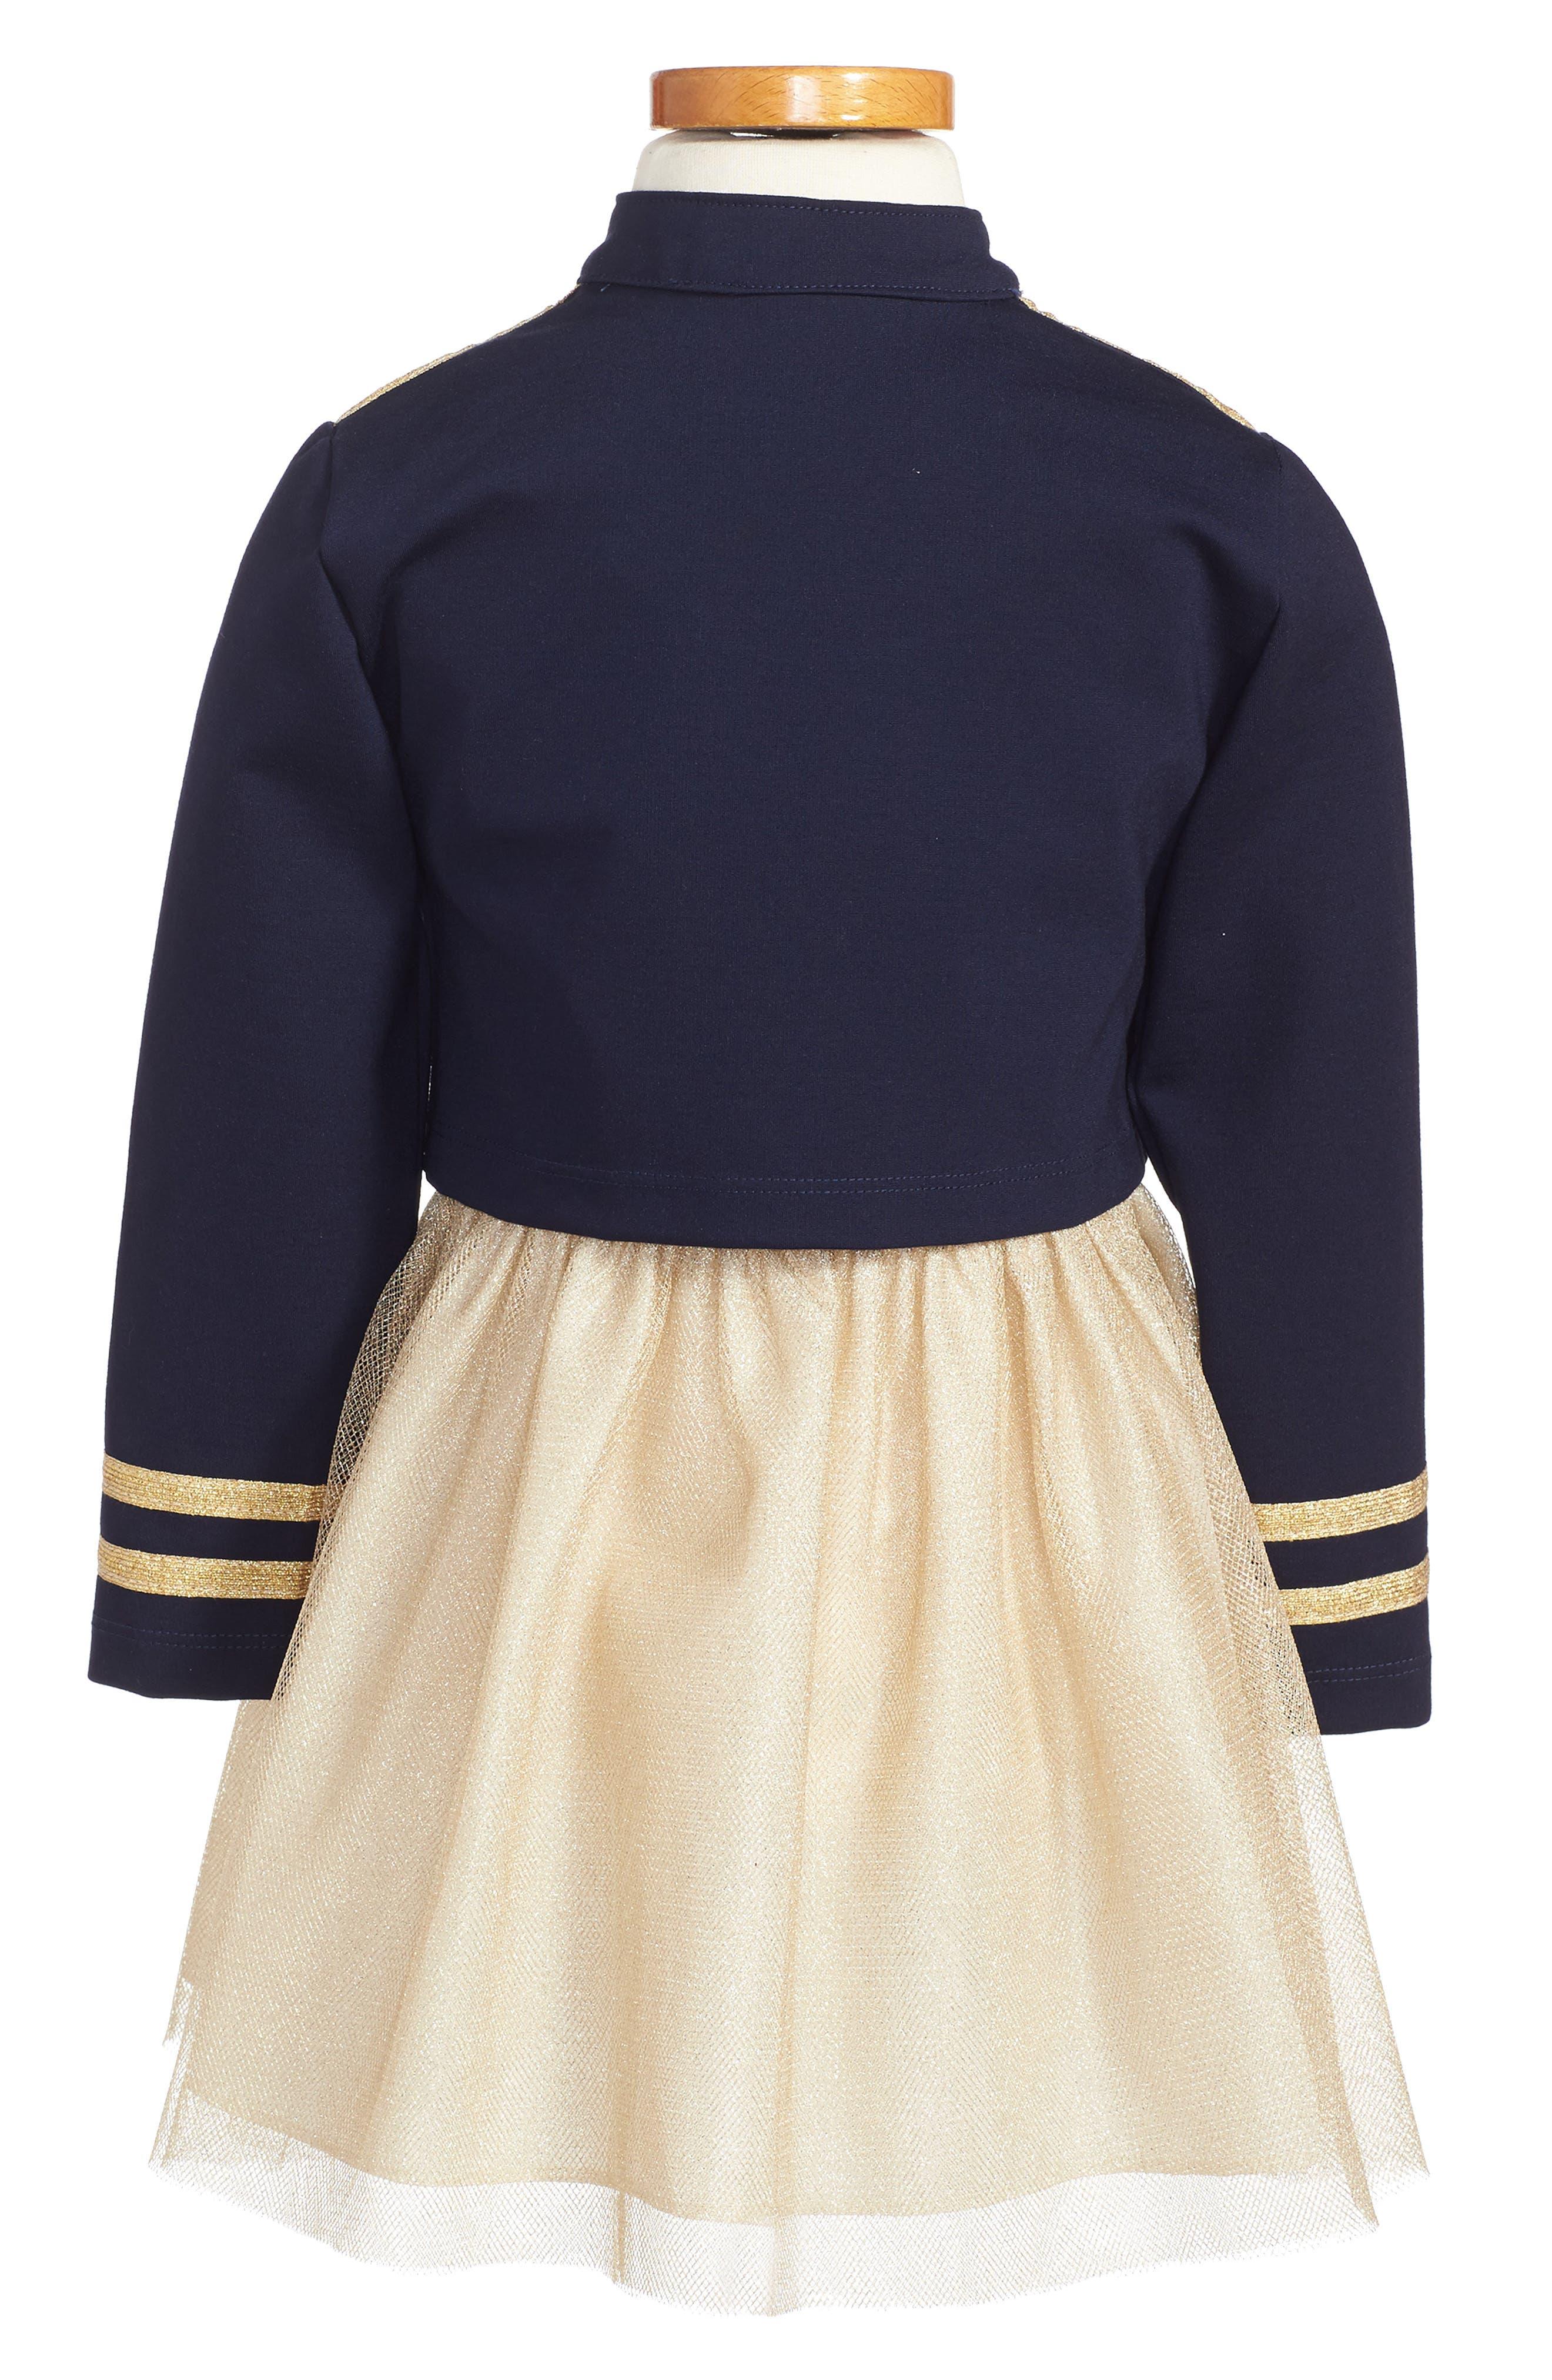 Majorette Jacket & Tank Dress Set,                             Alternate thumbnail 2, color,                             Navy/ Gold